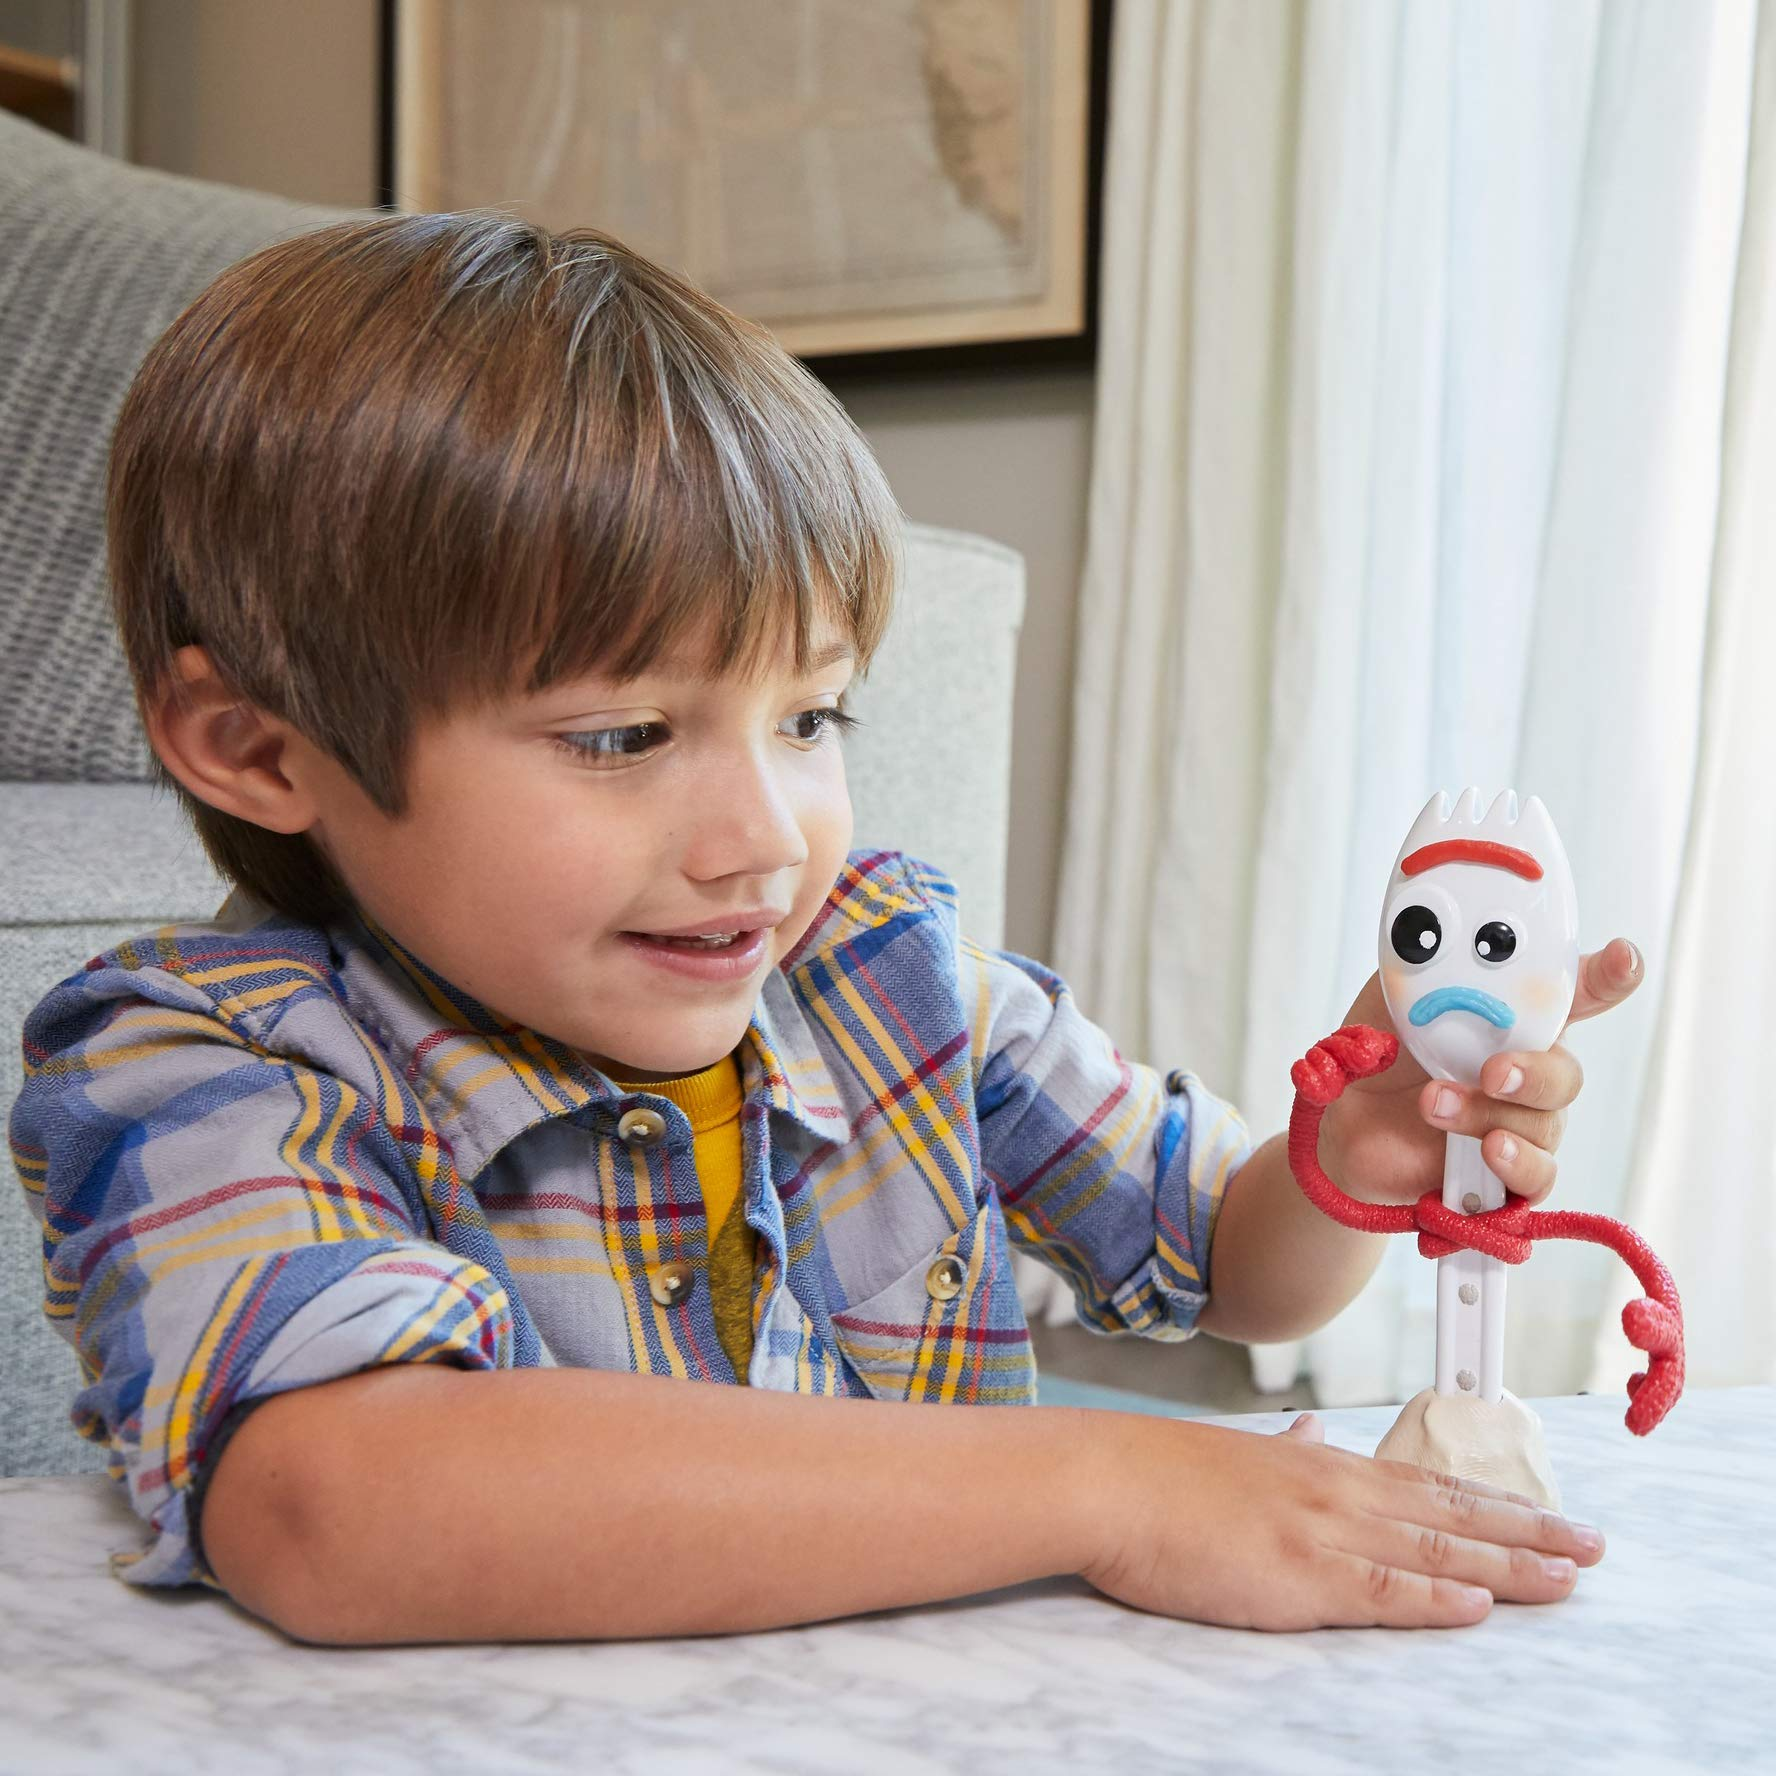 Disney GGB25 Pixar Toy Story 4 Parlant Forky Avec 15 Phrases